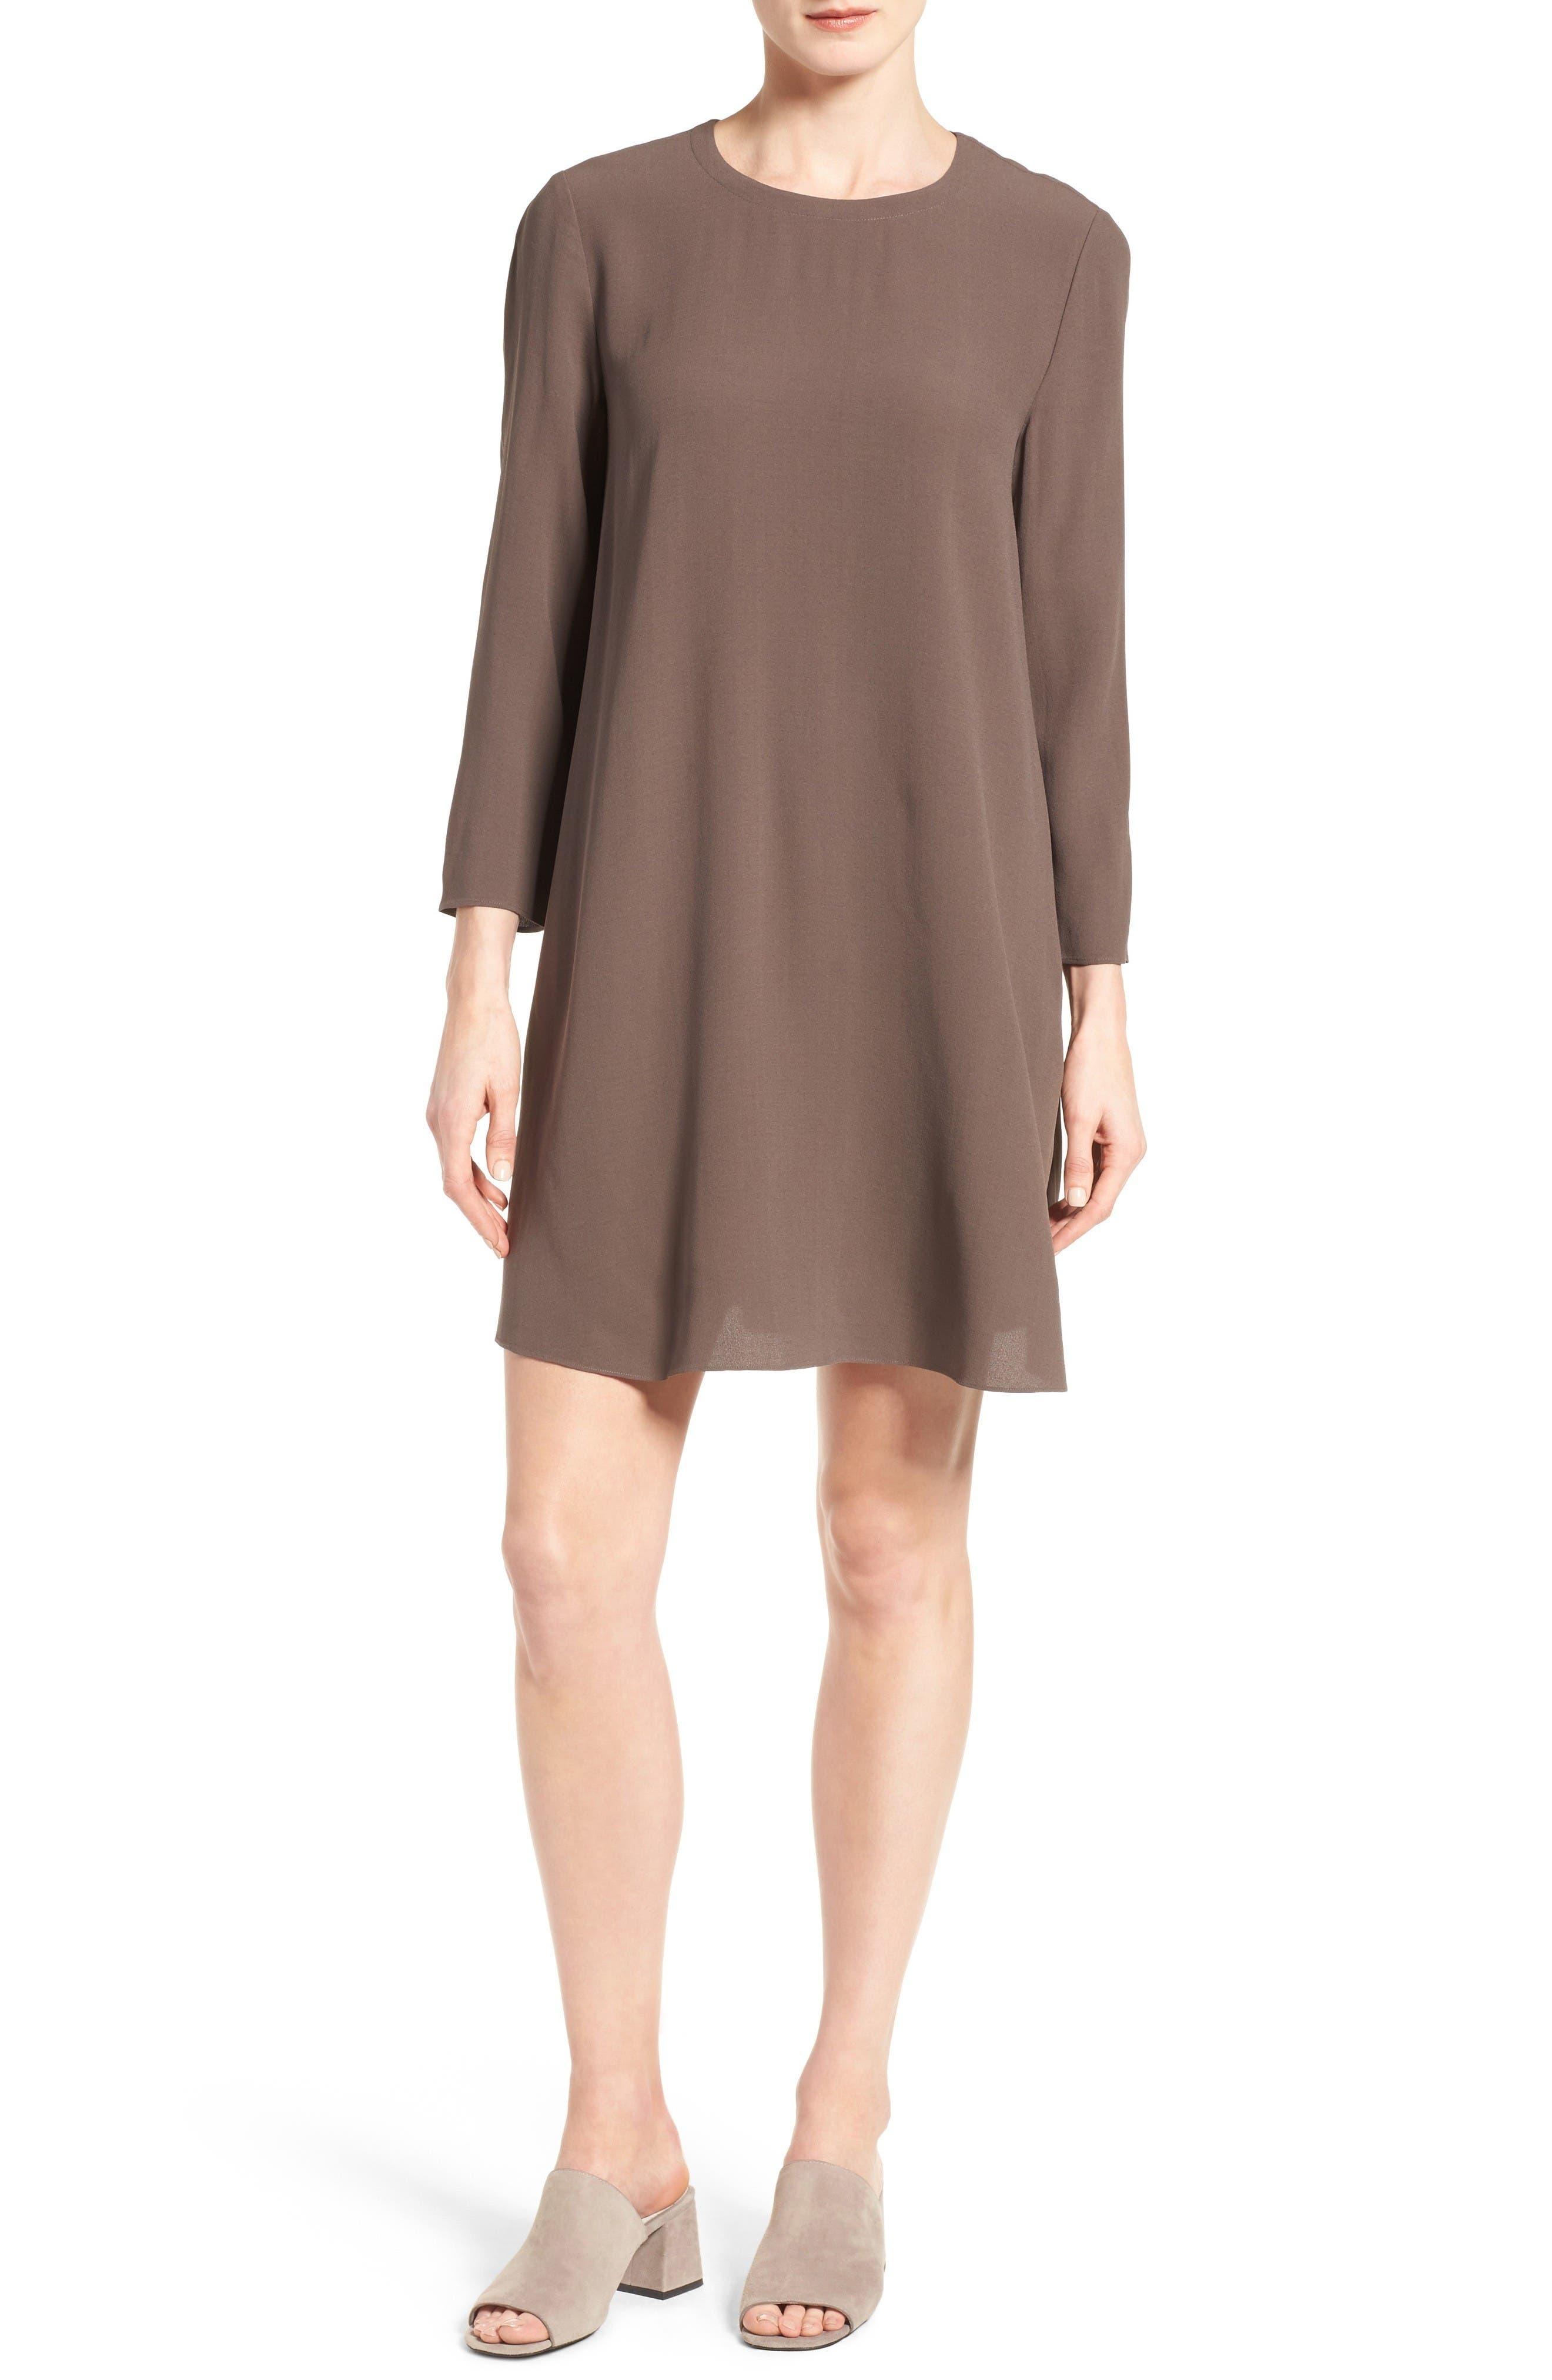 Eileen Fisher Silk Georgette Crepe Shift Dress (Regular & Petite)